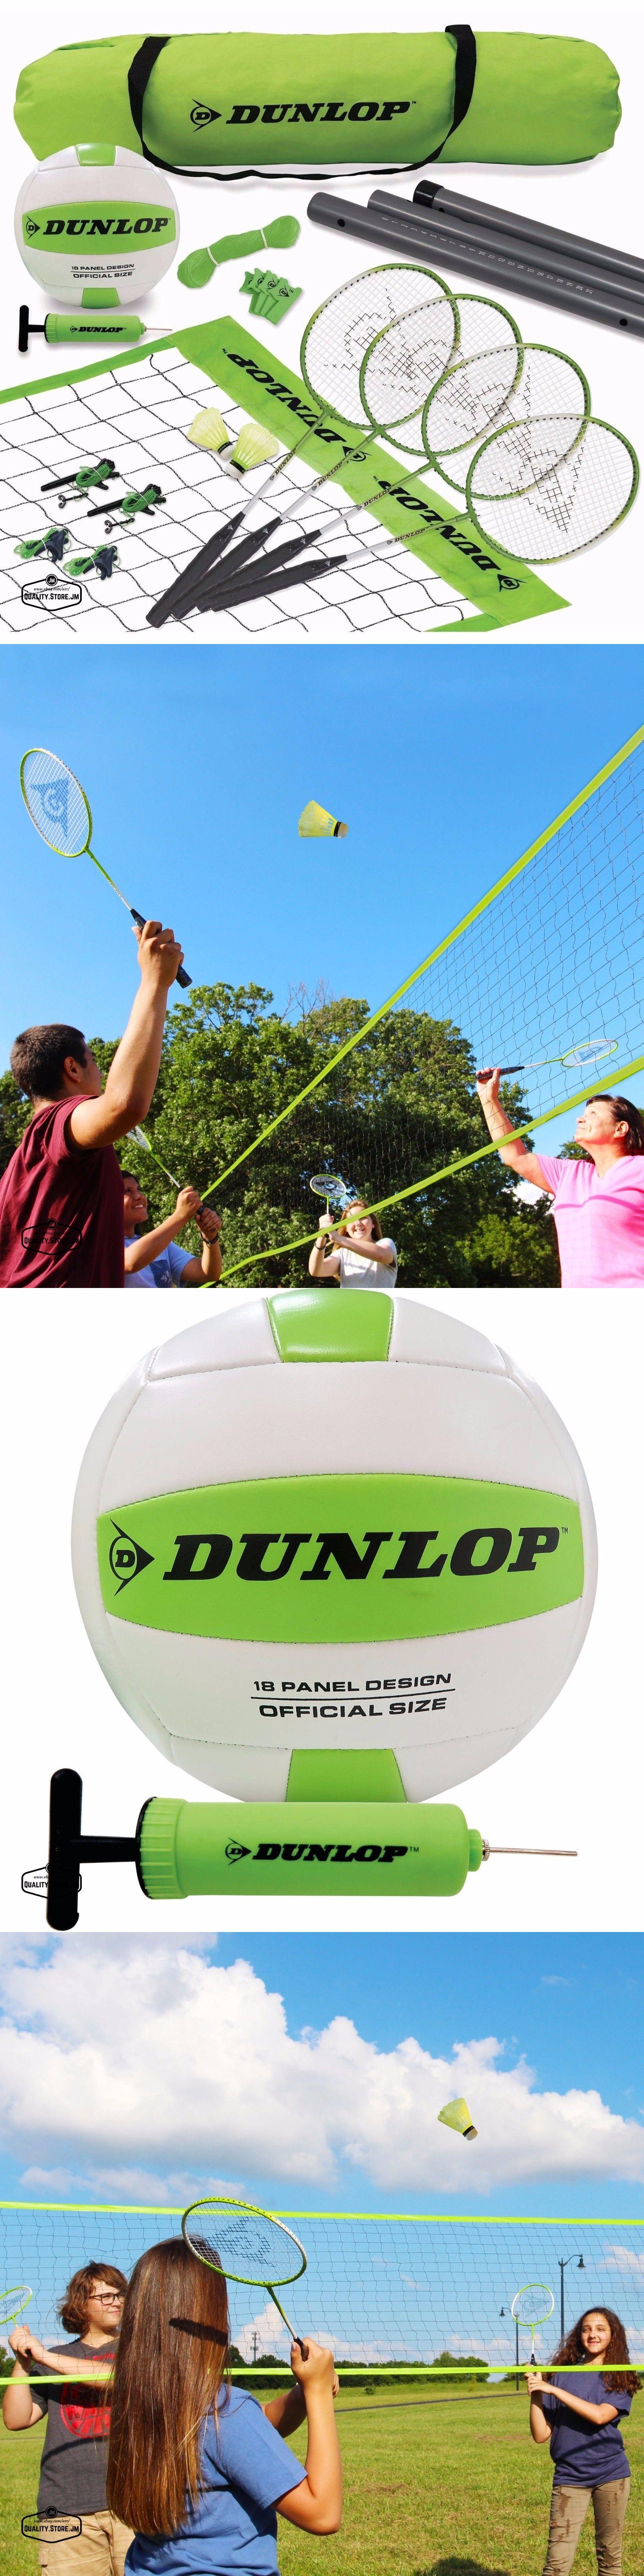 other backyard games 159081 volleyball set badminton bag ball